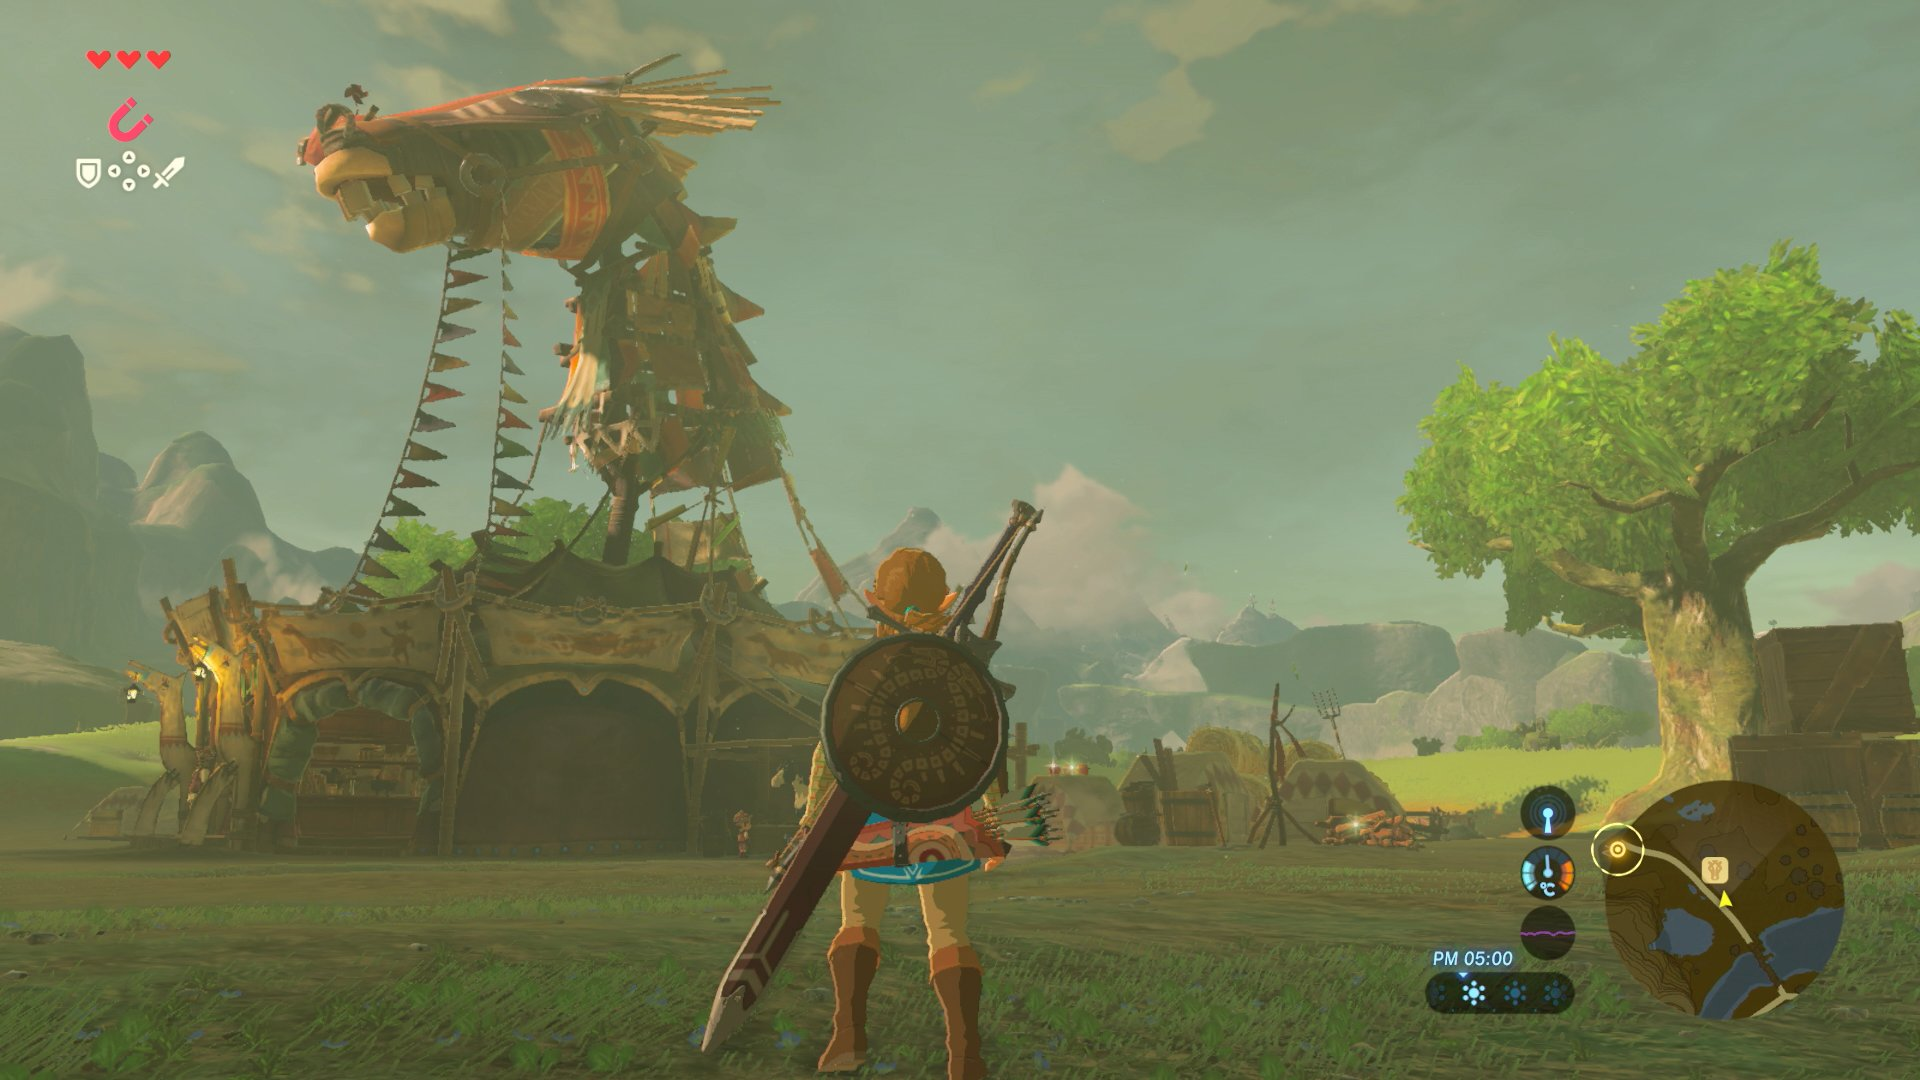 Nové screenshoty z The Legend of Zelda: Breath of the Wild 139300